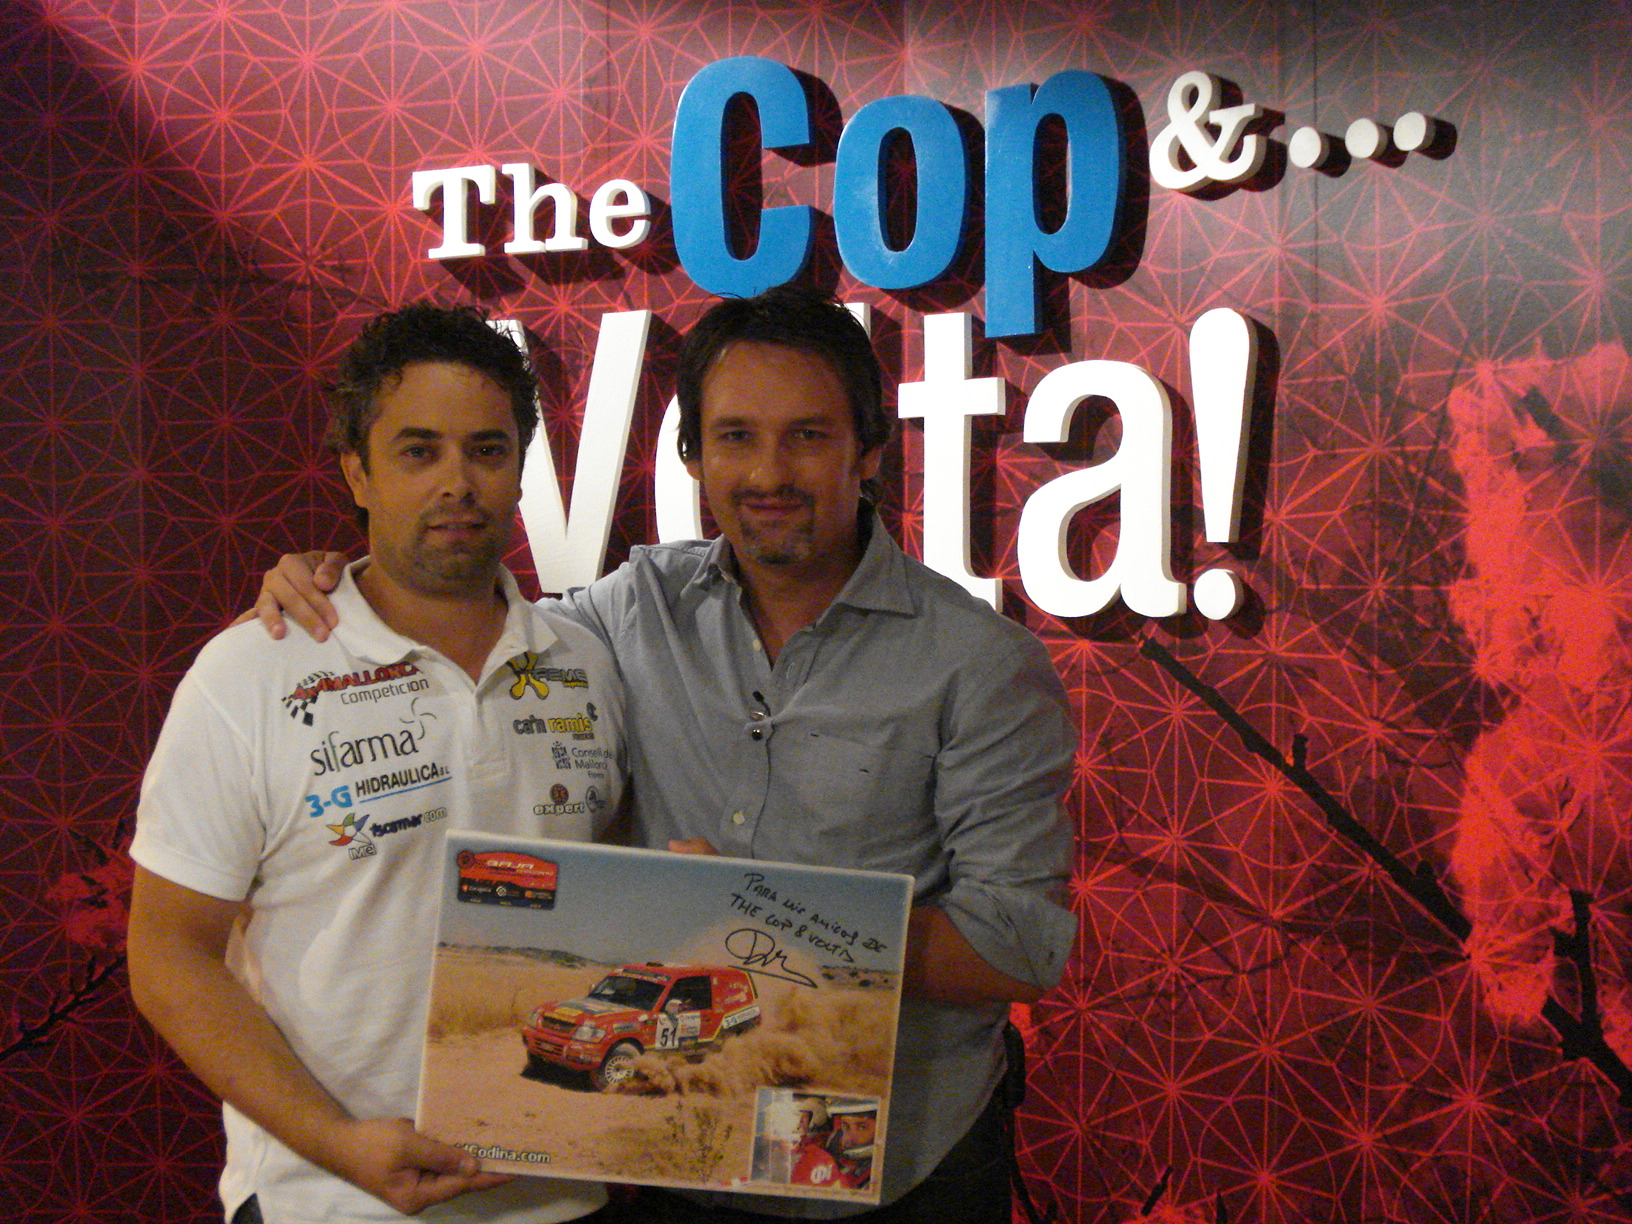 Entrevista The Cop & Volta